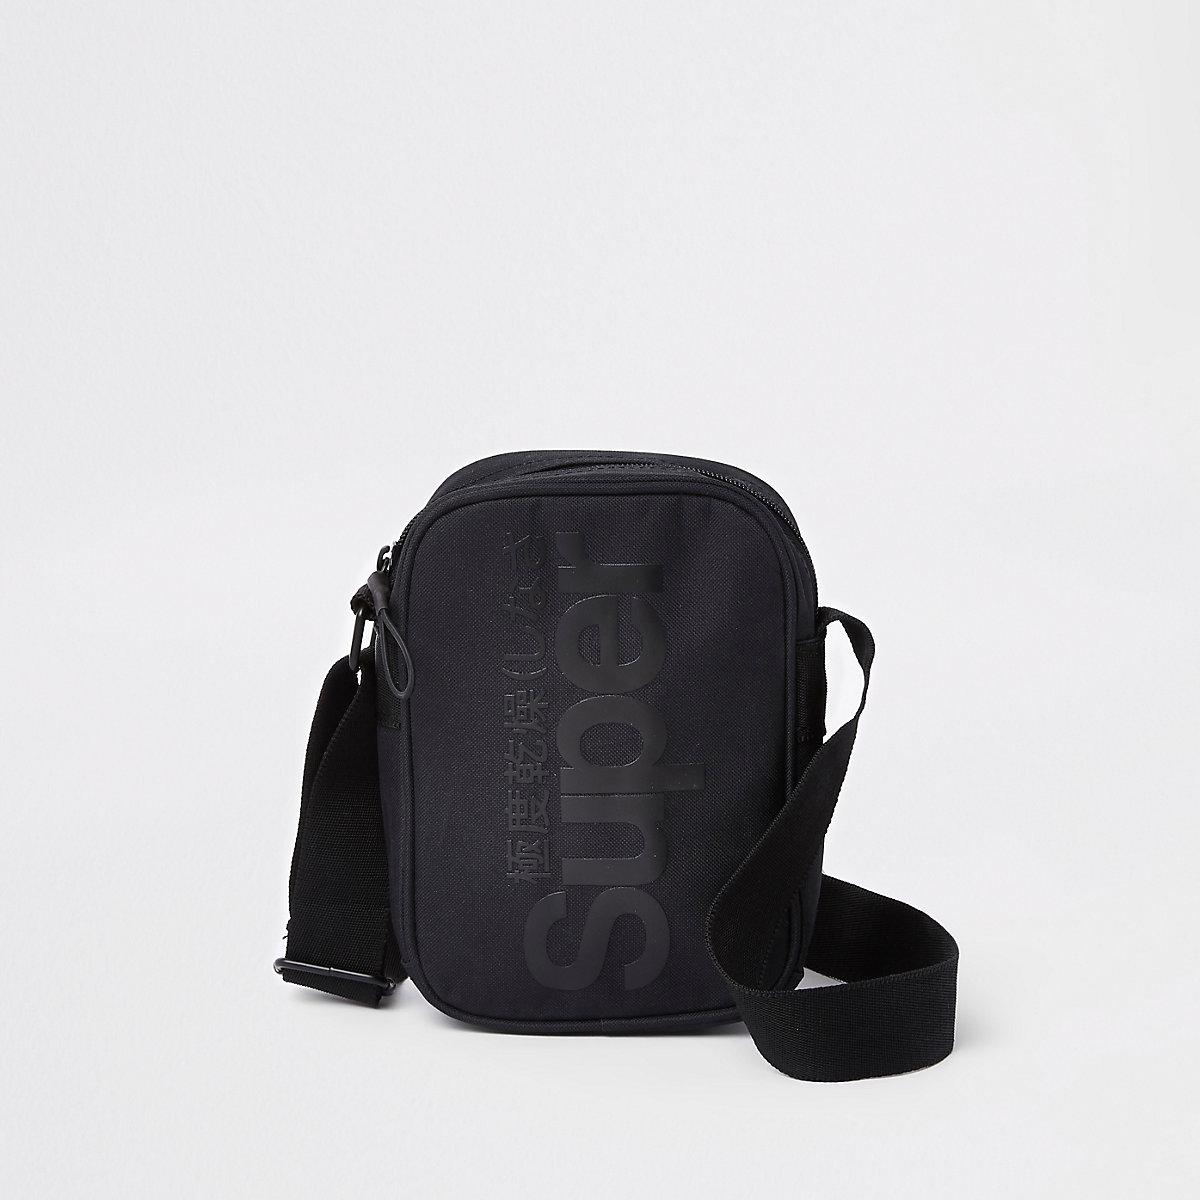 Superdry black cross body pouch